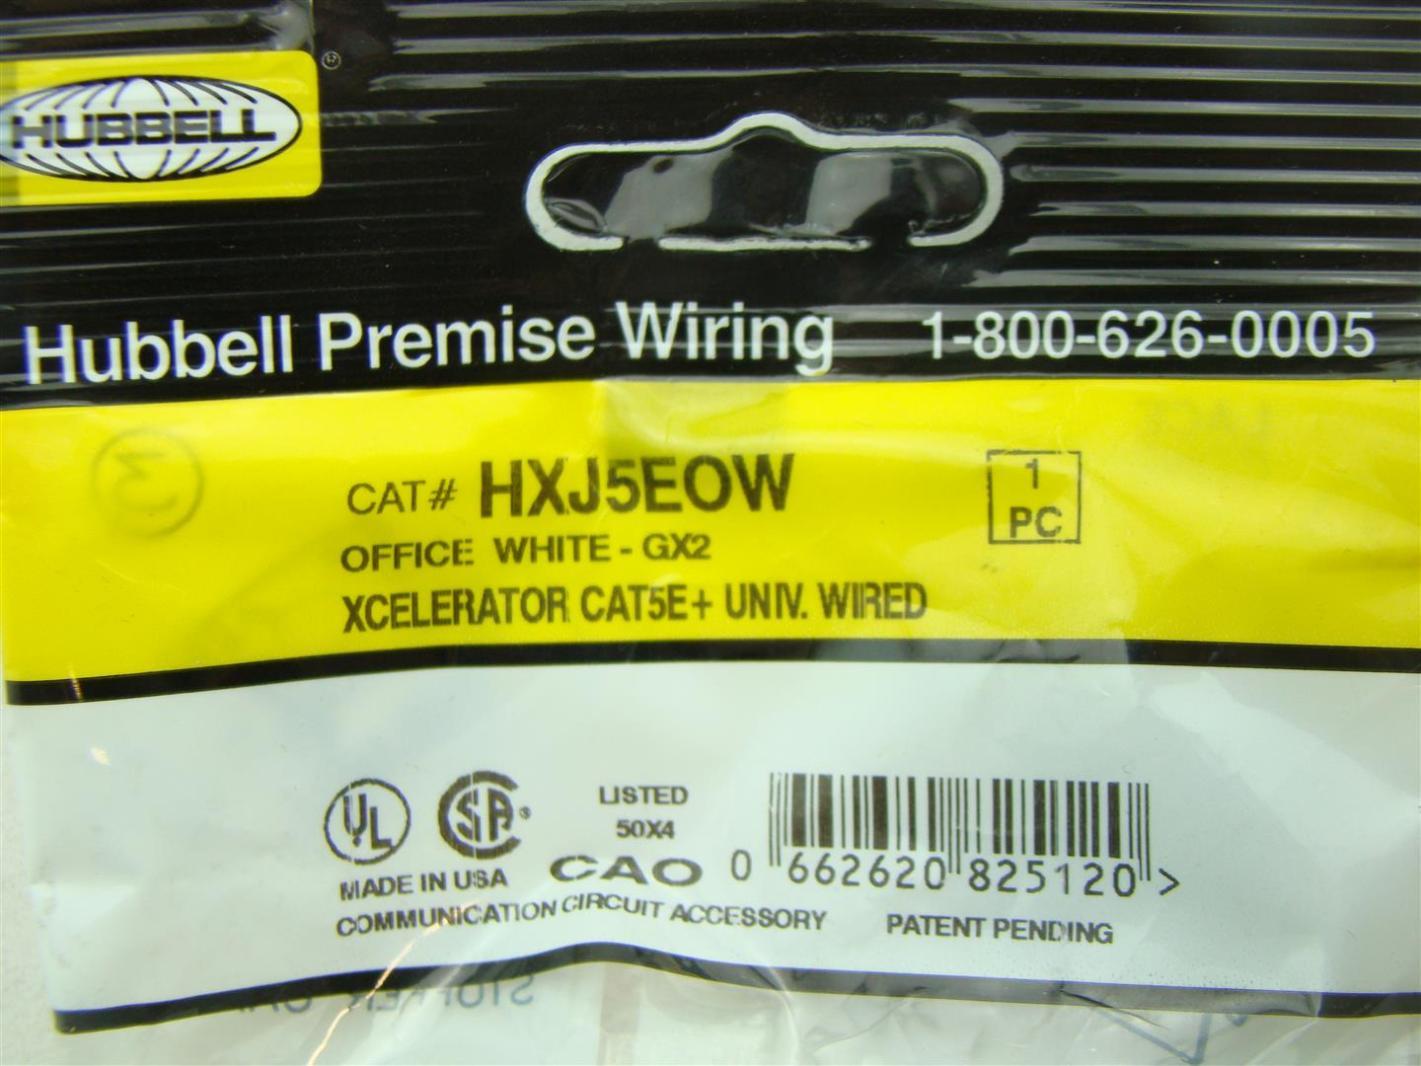 9 pcs hubbell premise wiring hxj5eow joseph fazzio incorporated rh fazziosurplus com hubbell premise wiring ftu1sp hubbell premise wiring devices